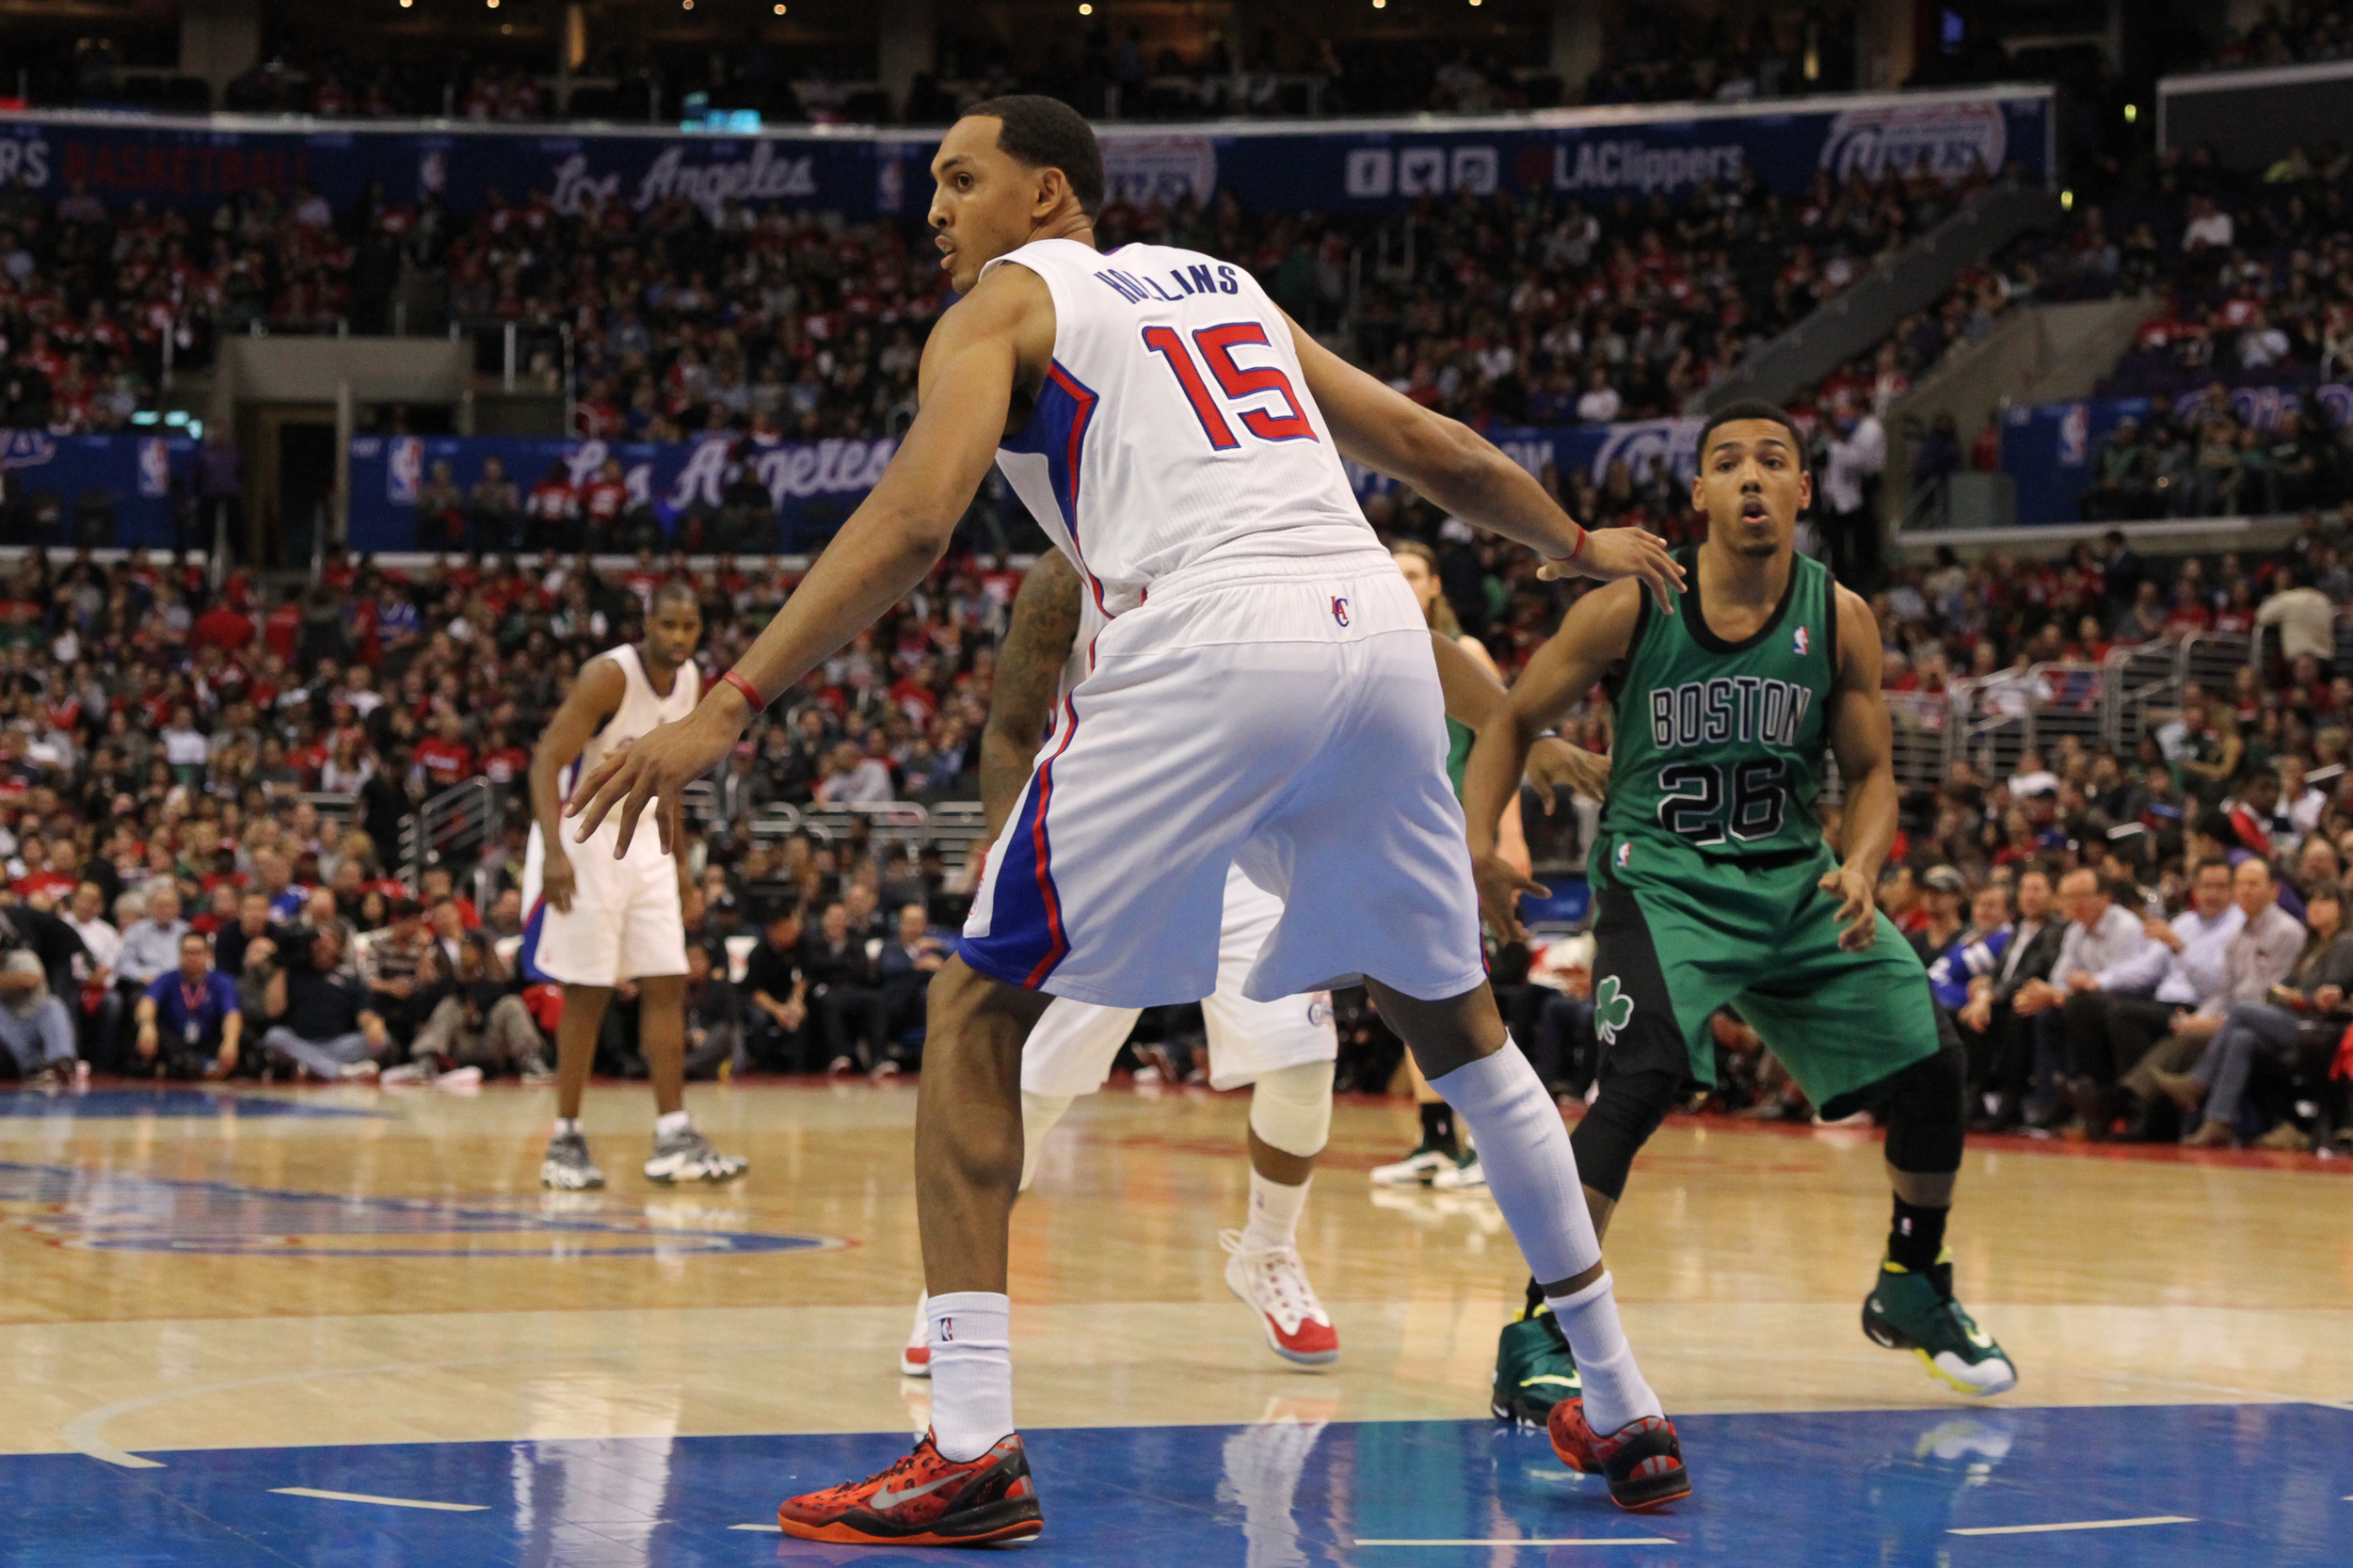 Photos by Varon P. Celtics FR-23.jpg